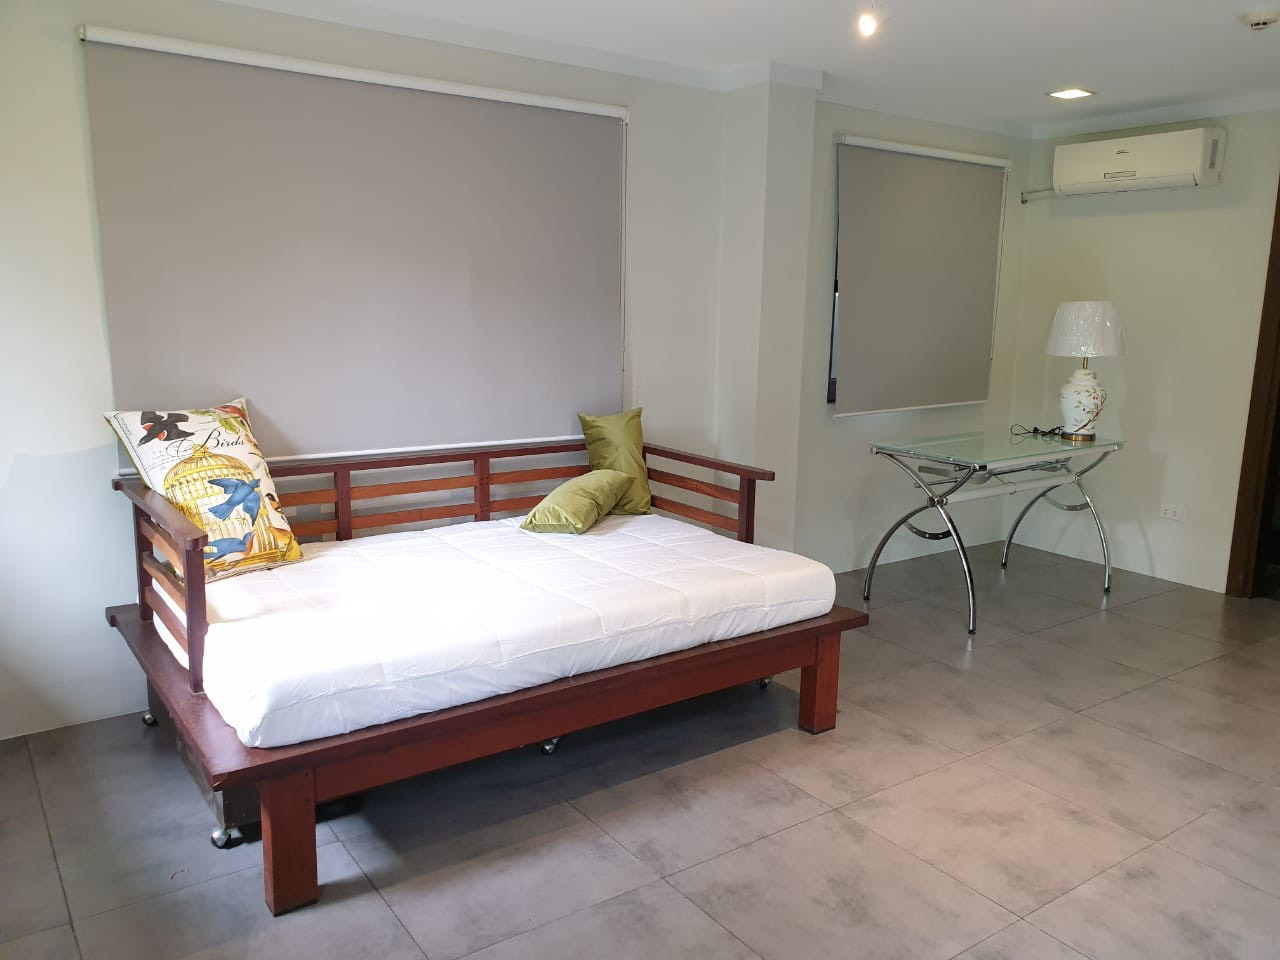 4 Bedrooms House For Sale, Ayala Alabang 8